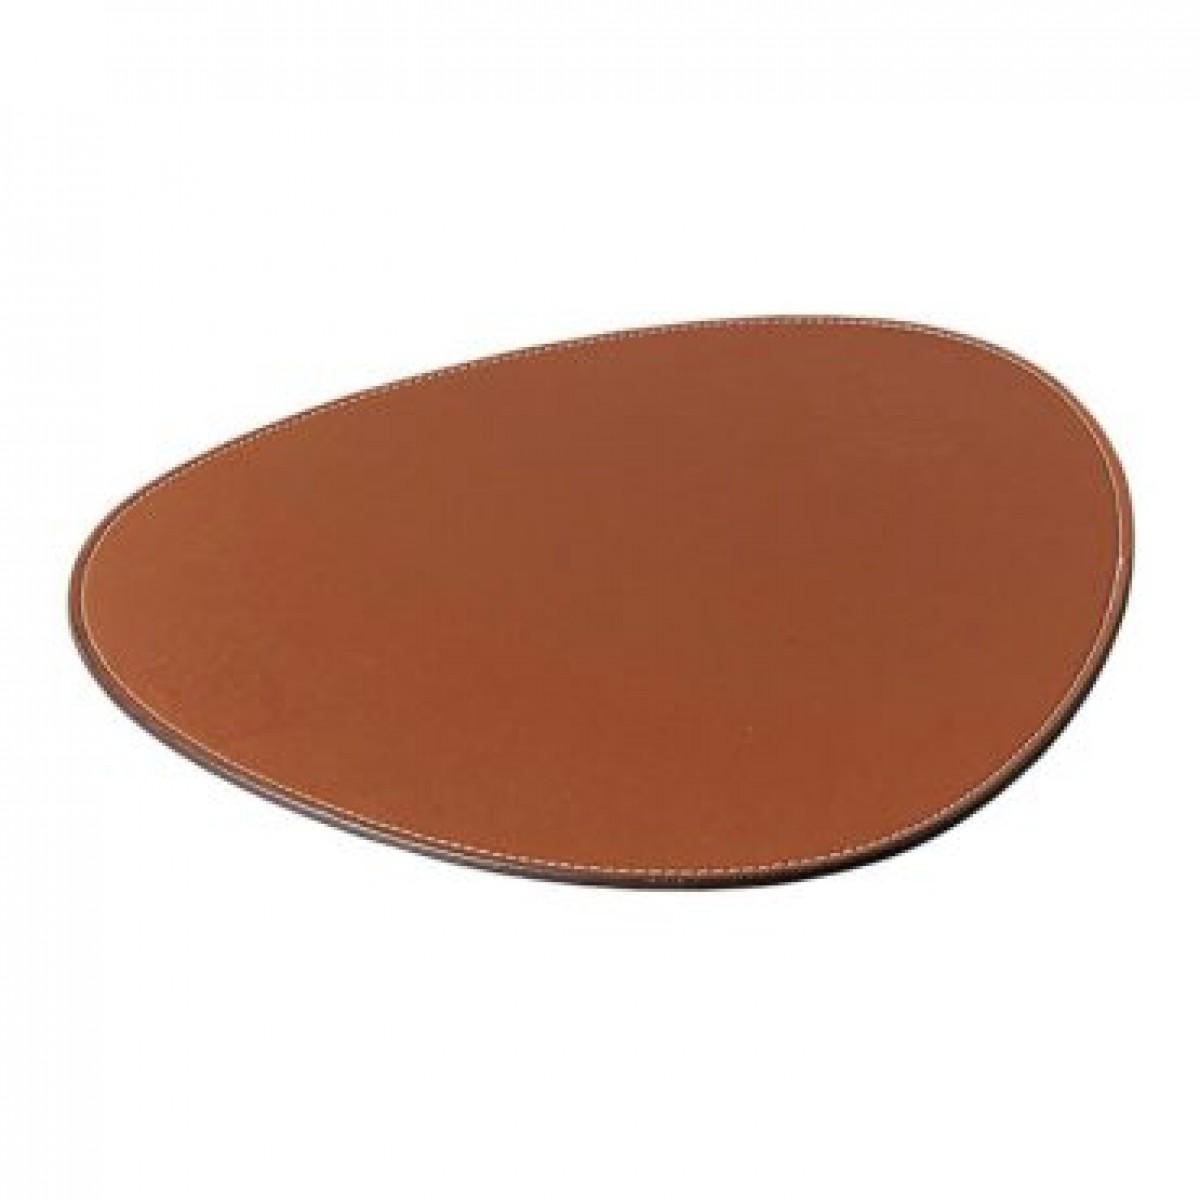 DACORE Dækkeserviet oval lys brun læderlook